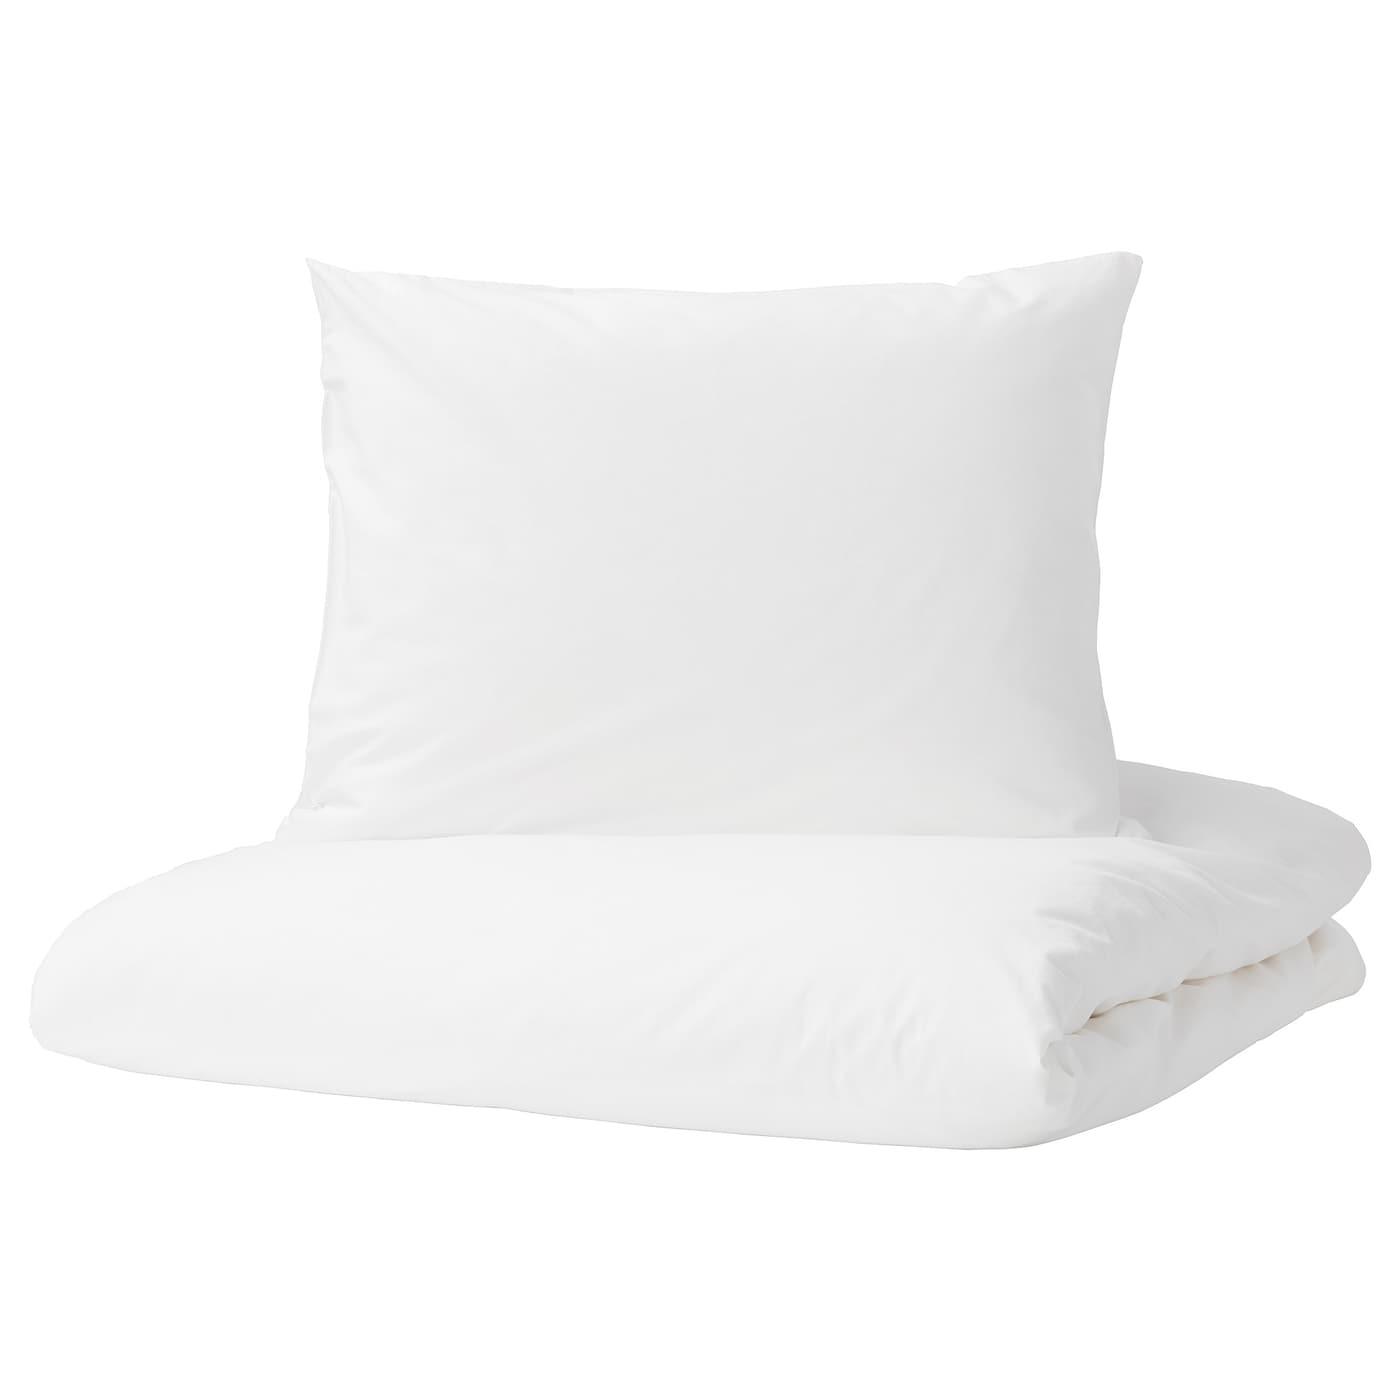 brimnes cadre lit avec rangement blanc 160 x 200 cm ikea. Black Bedroom Furniture Sets. Home Design Ideas